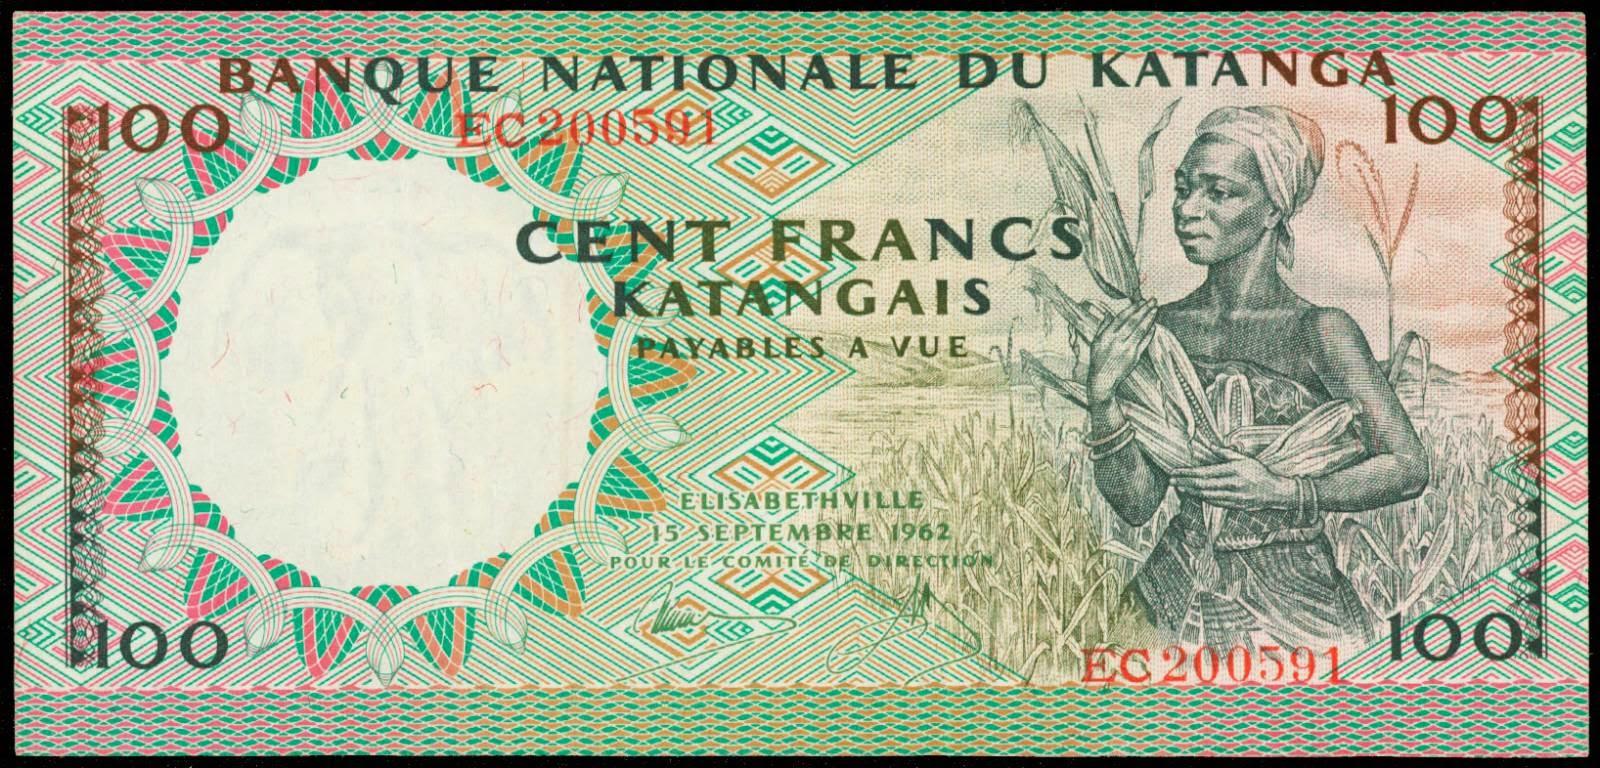 Katanga banknotes 100 Francs Katangais note 1962